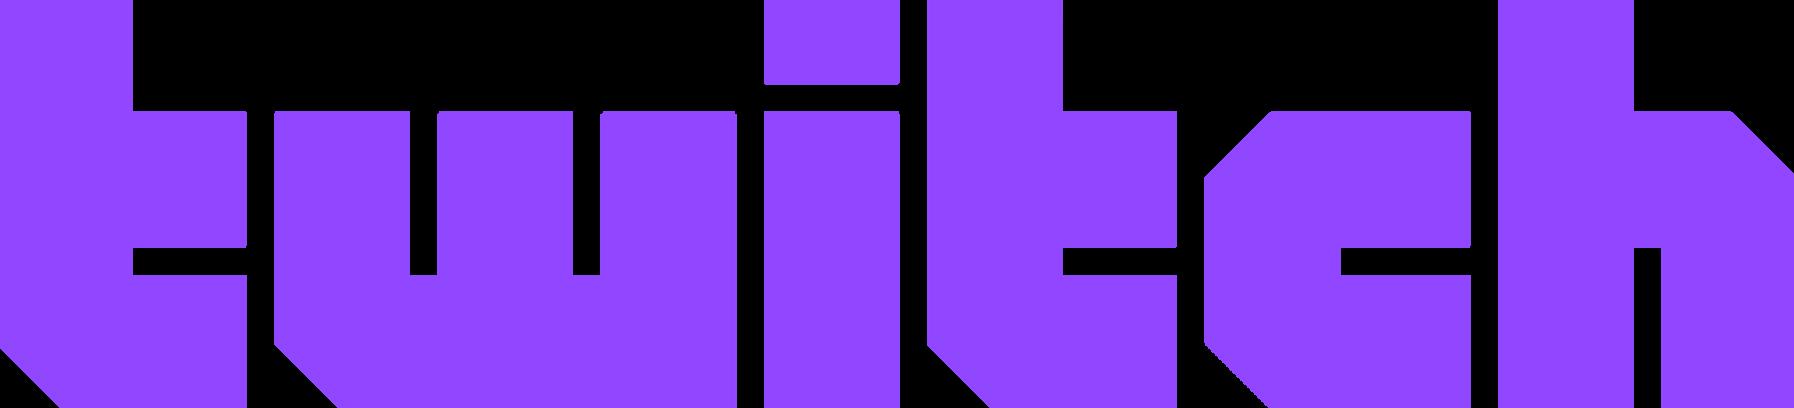 Twitch_UnextrudedWordmarkPurple.png